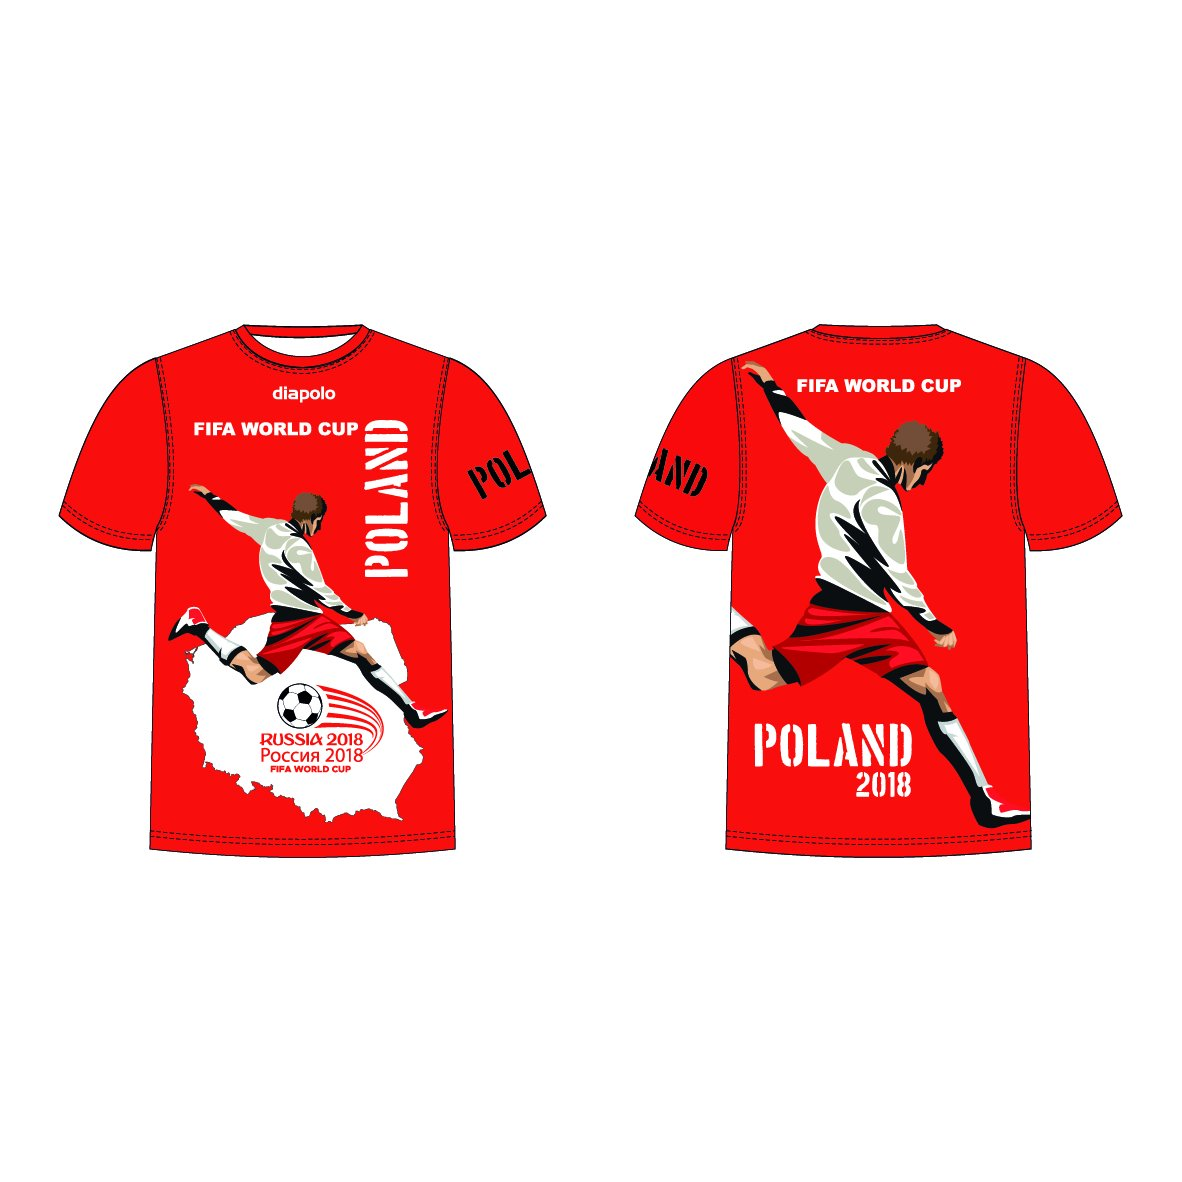 Diapolo Professional Atmungsaktiv Qualitativ Hochfertiger Funktion Fan T-shirt Poland S M L XL XXL